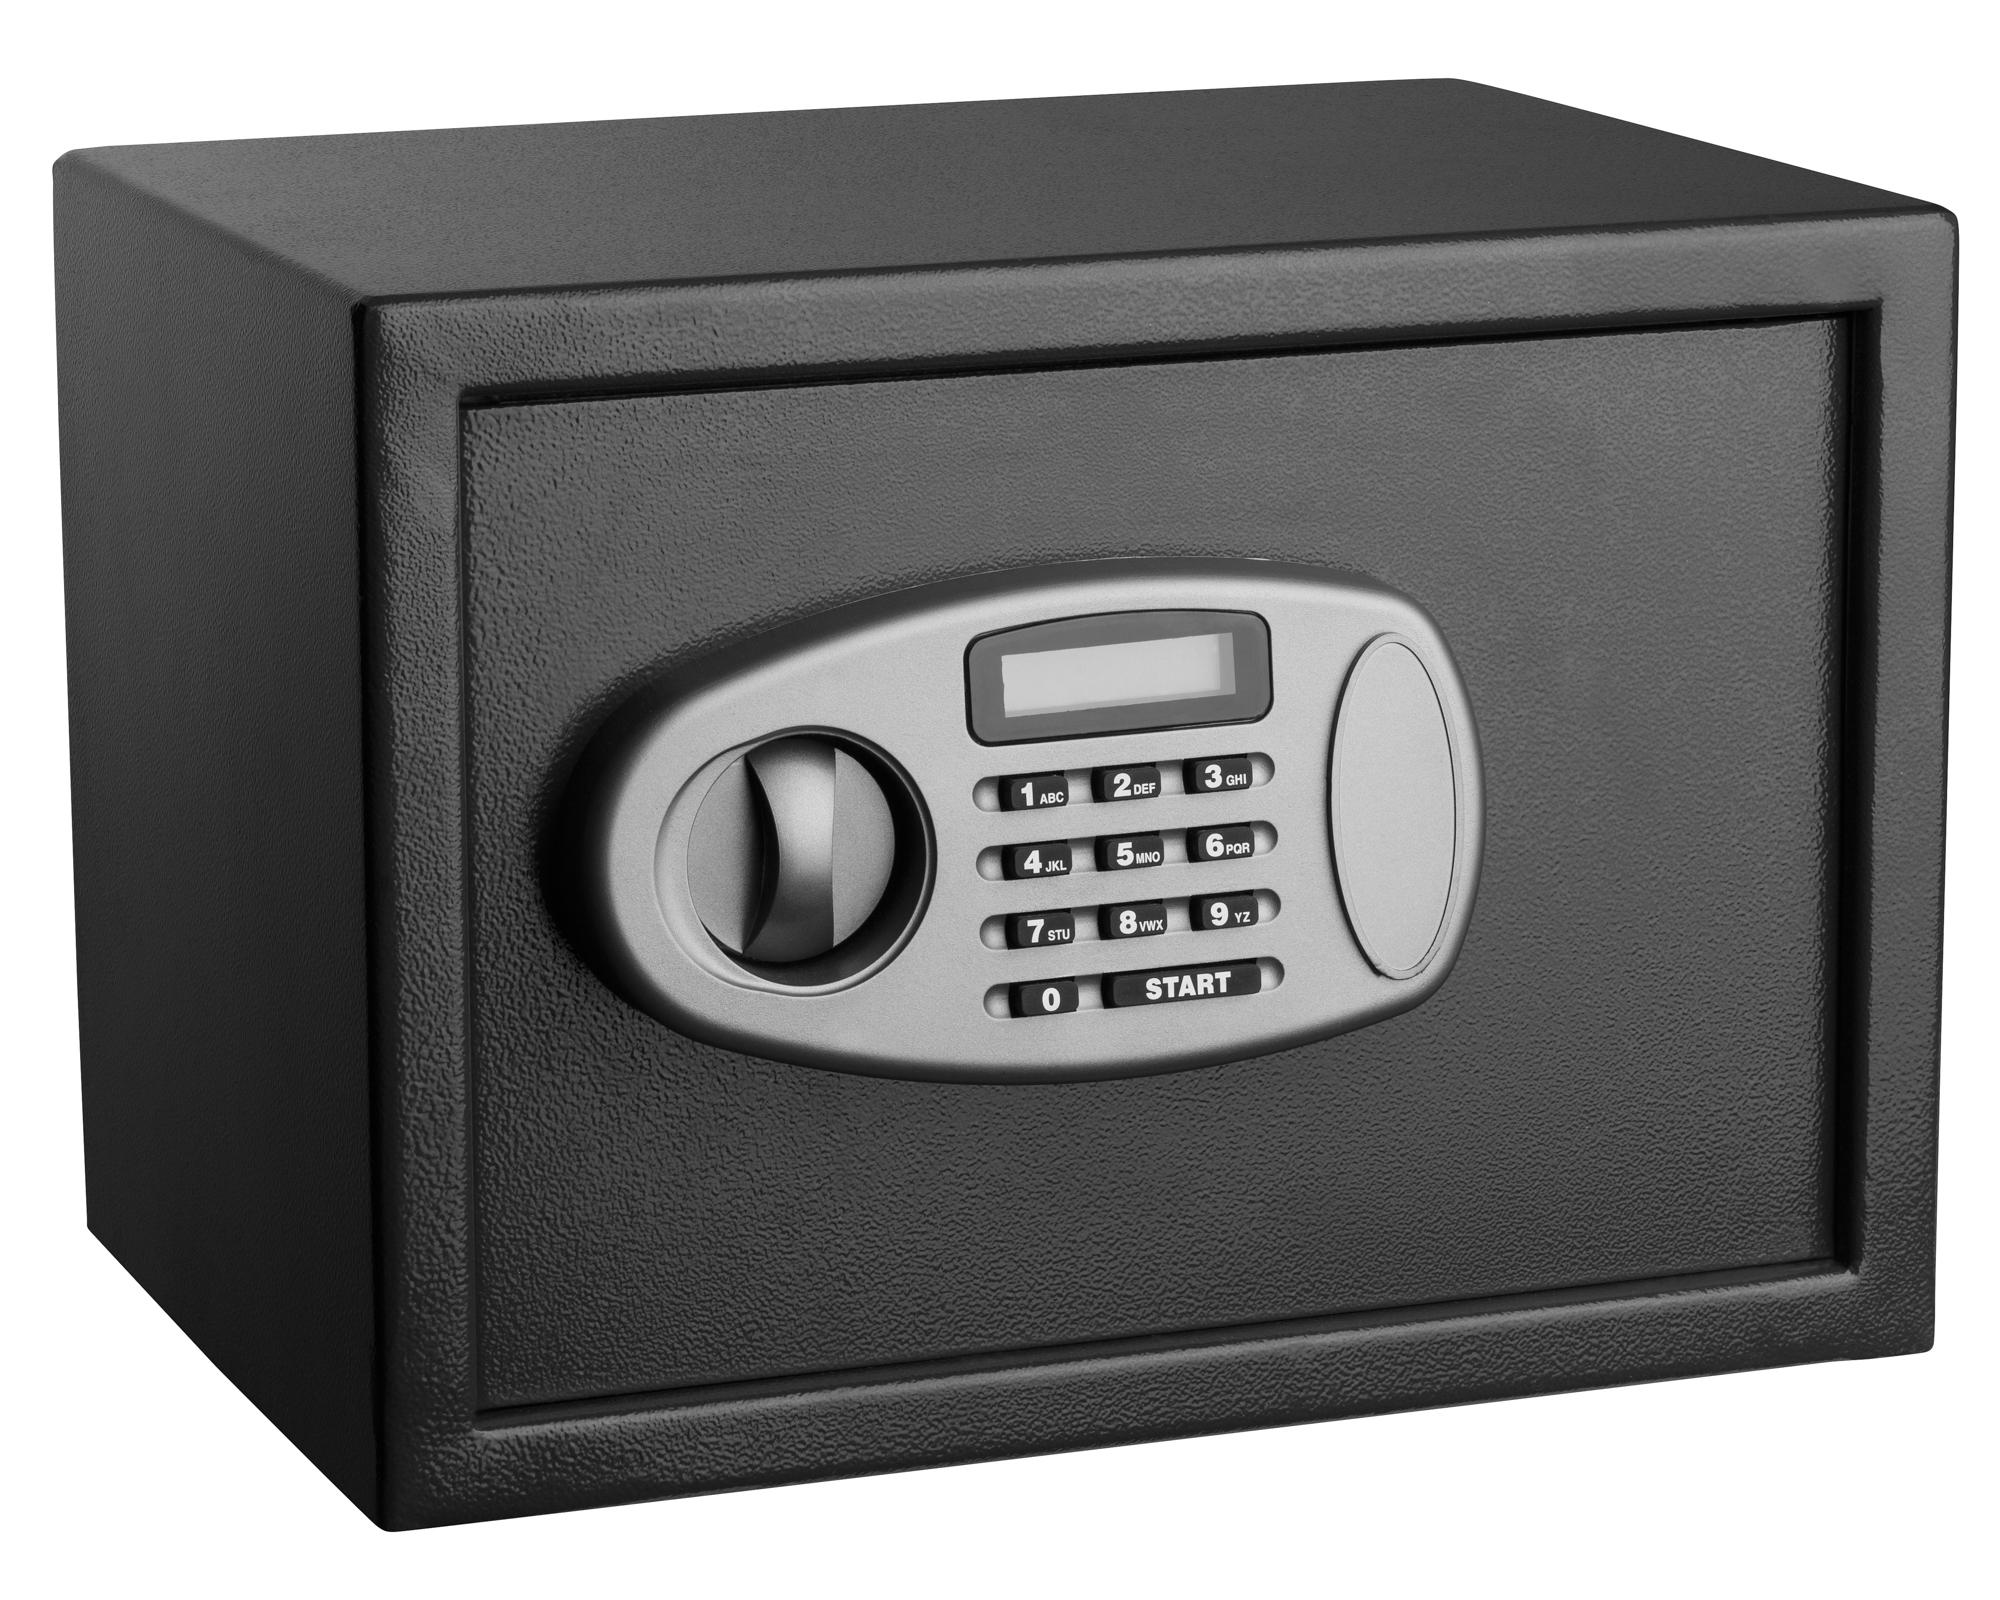 AdirOffice 0.5 Cubic Feet Security Safe with Digital Lock